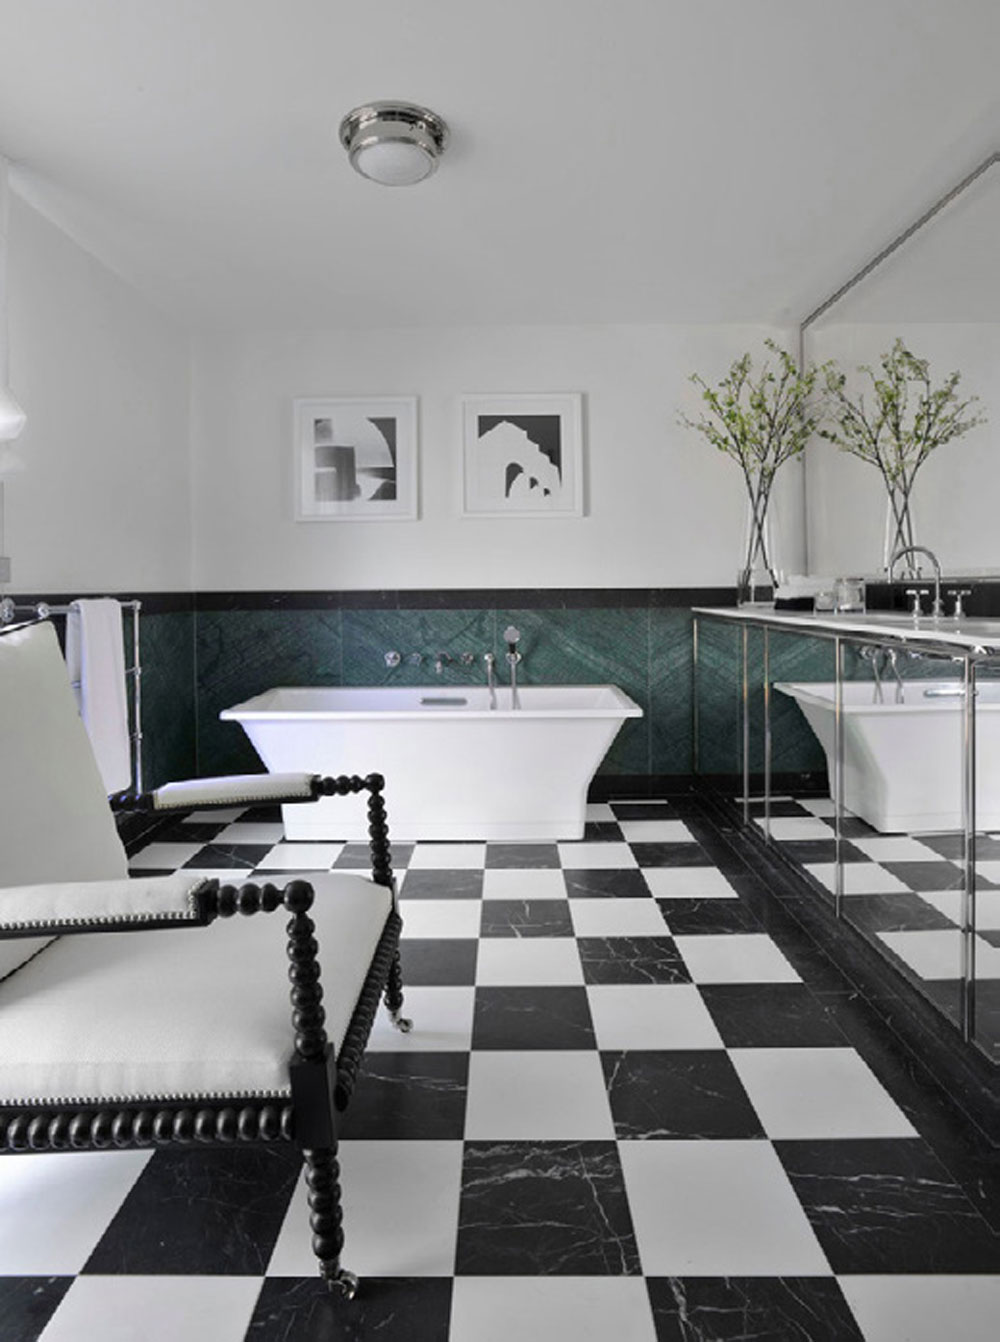 A-collection-of-bathroom-floor-tile-ideas-6 A collection of bathroom-floor-tile-ideas